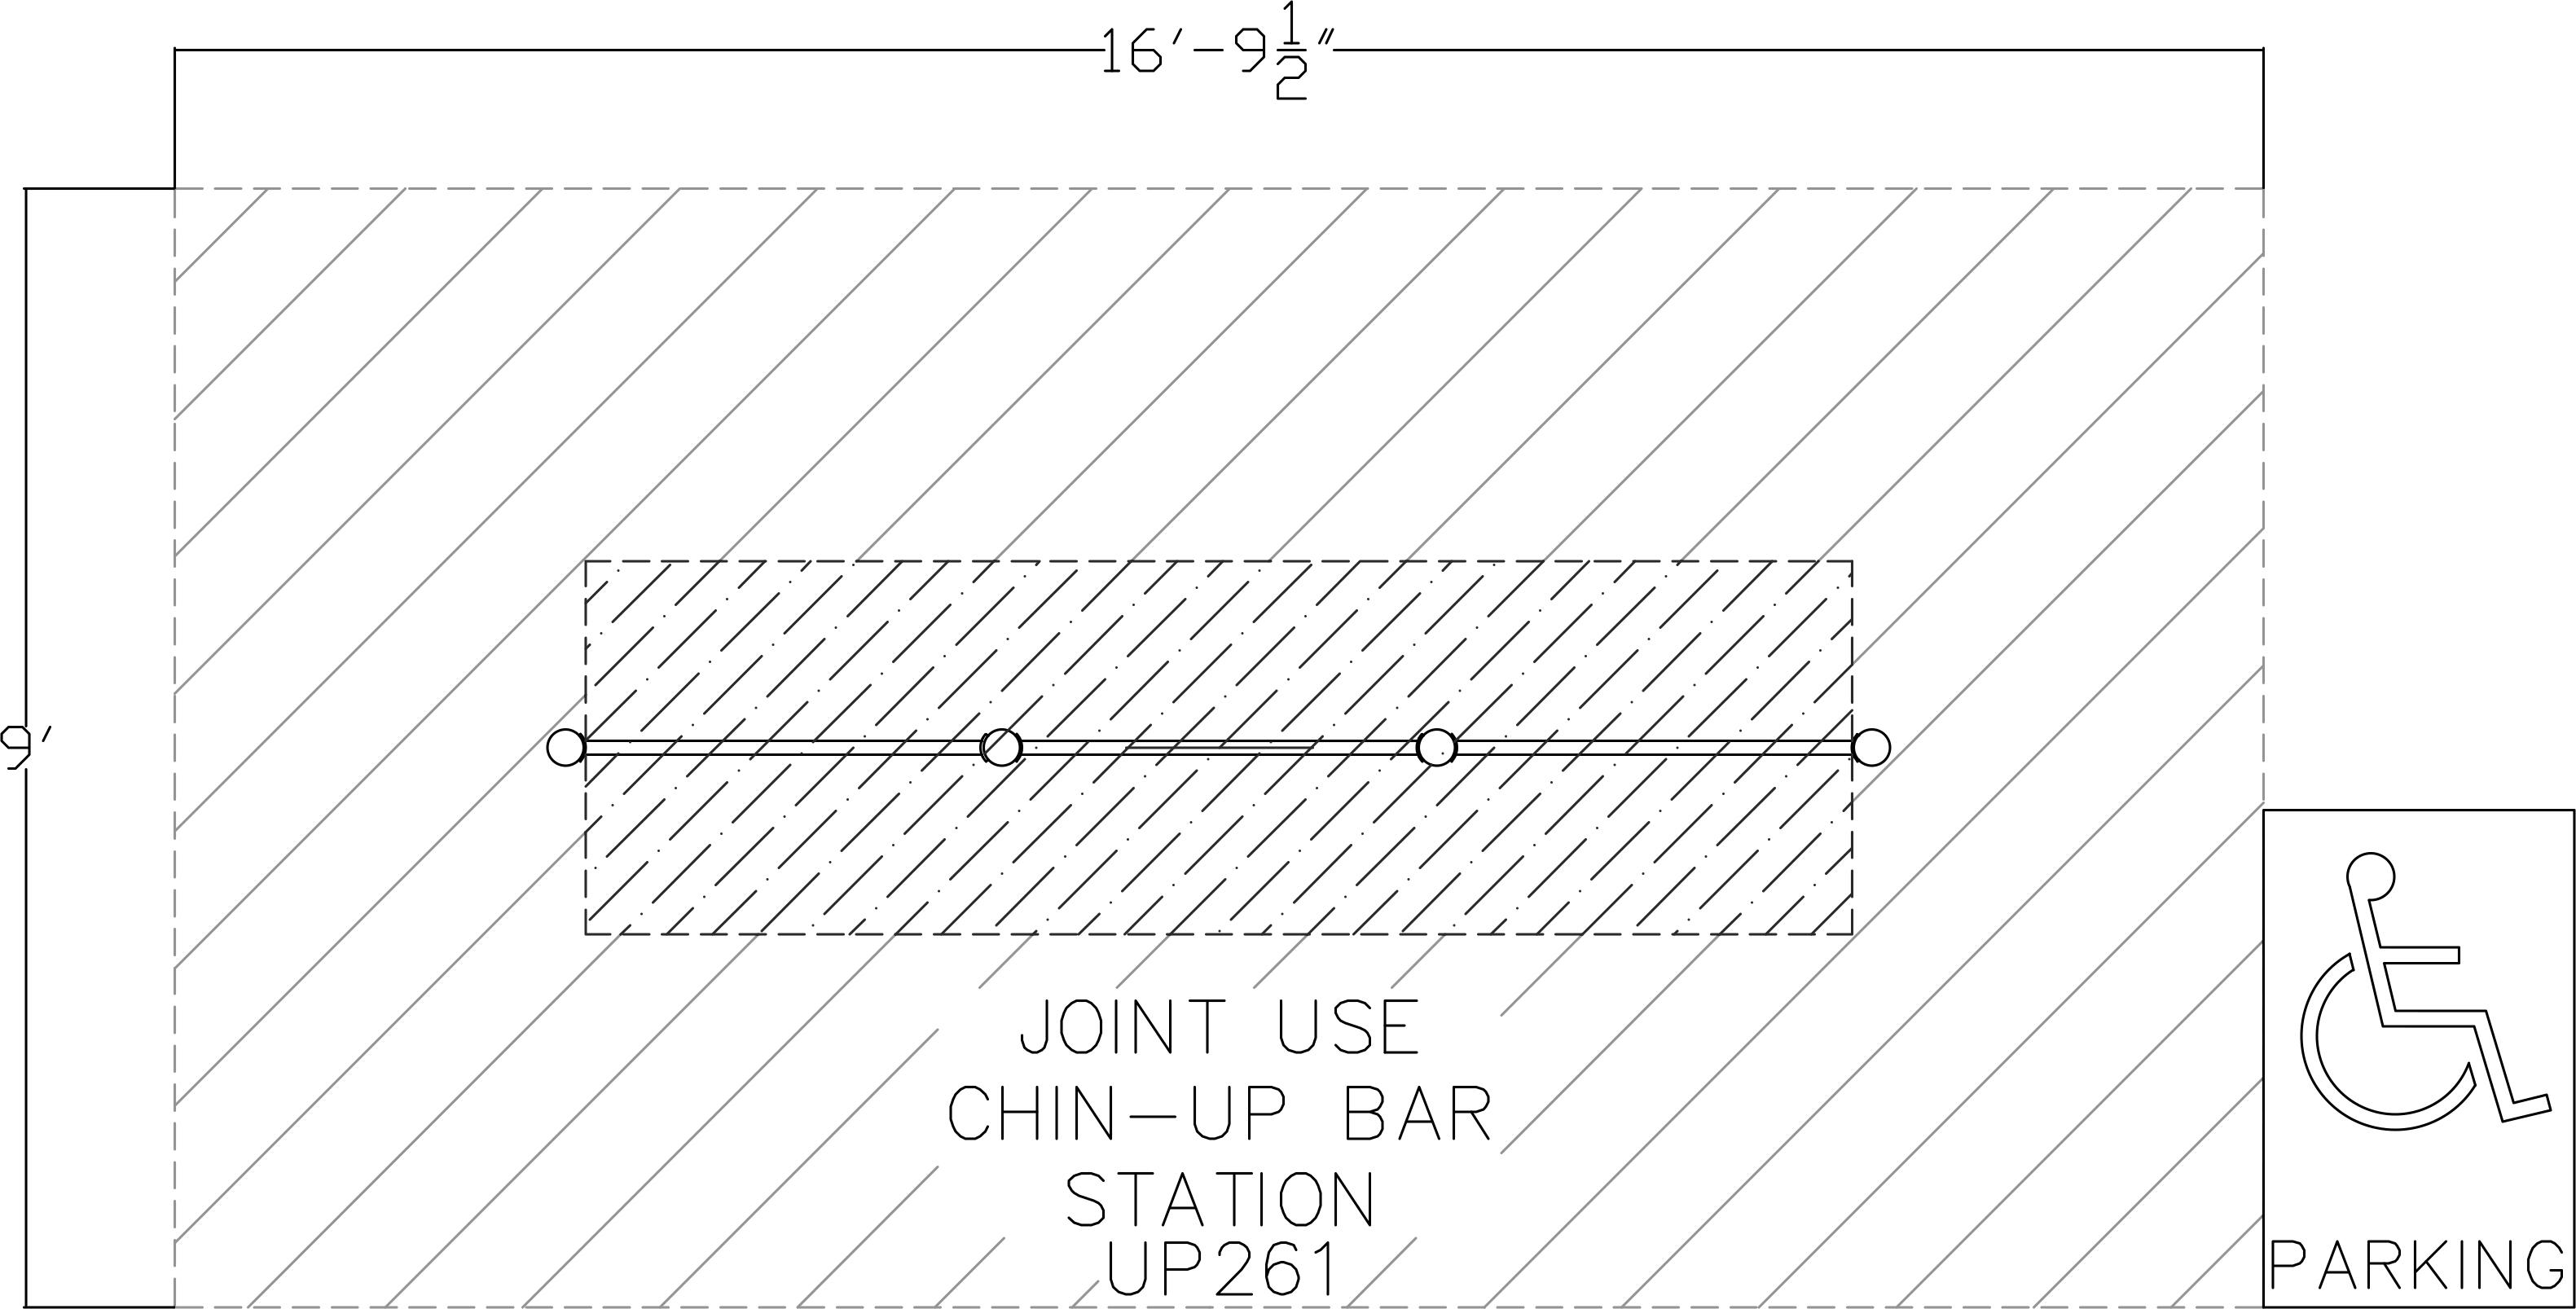 3 Level Chin-Up Bar Station